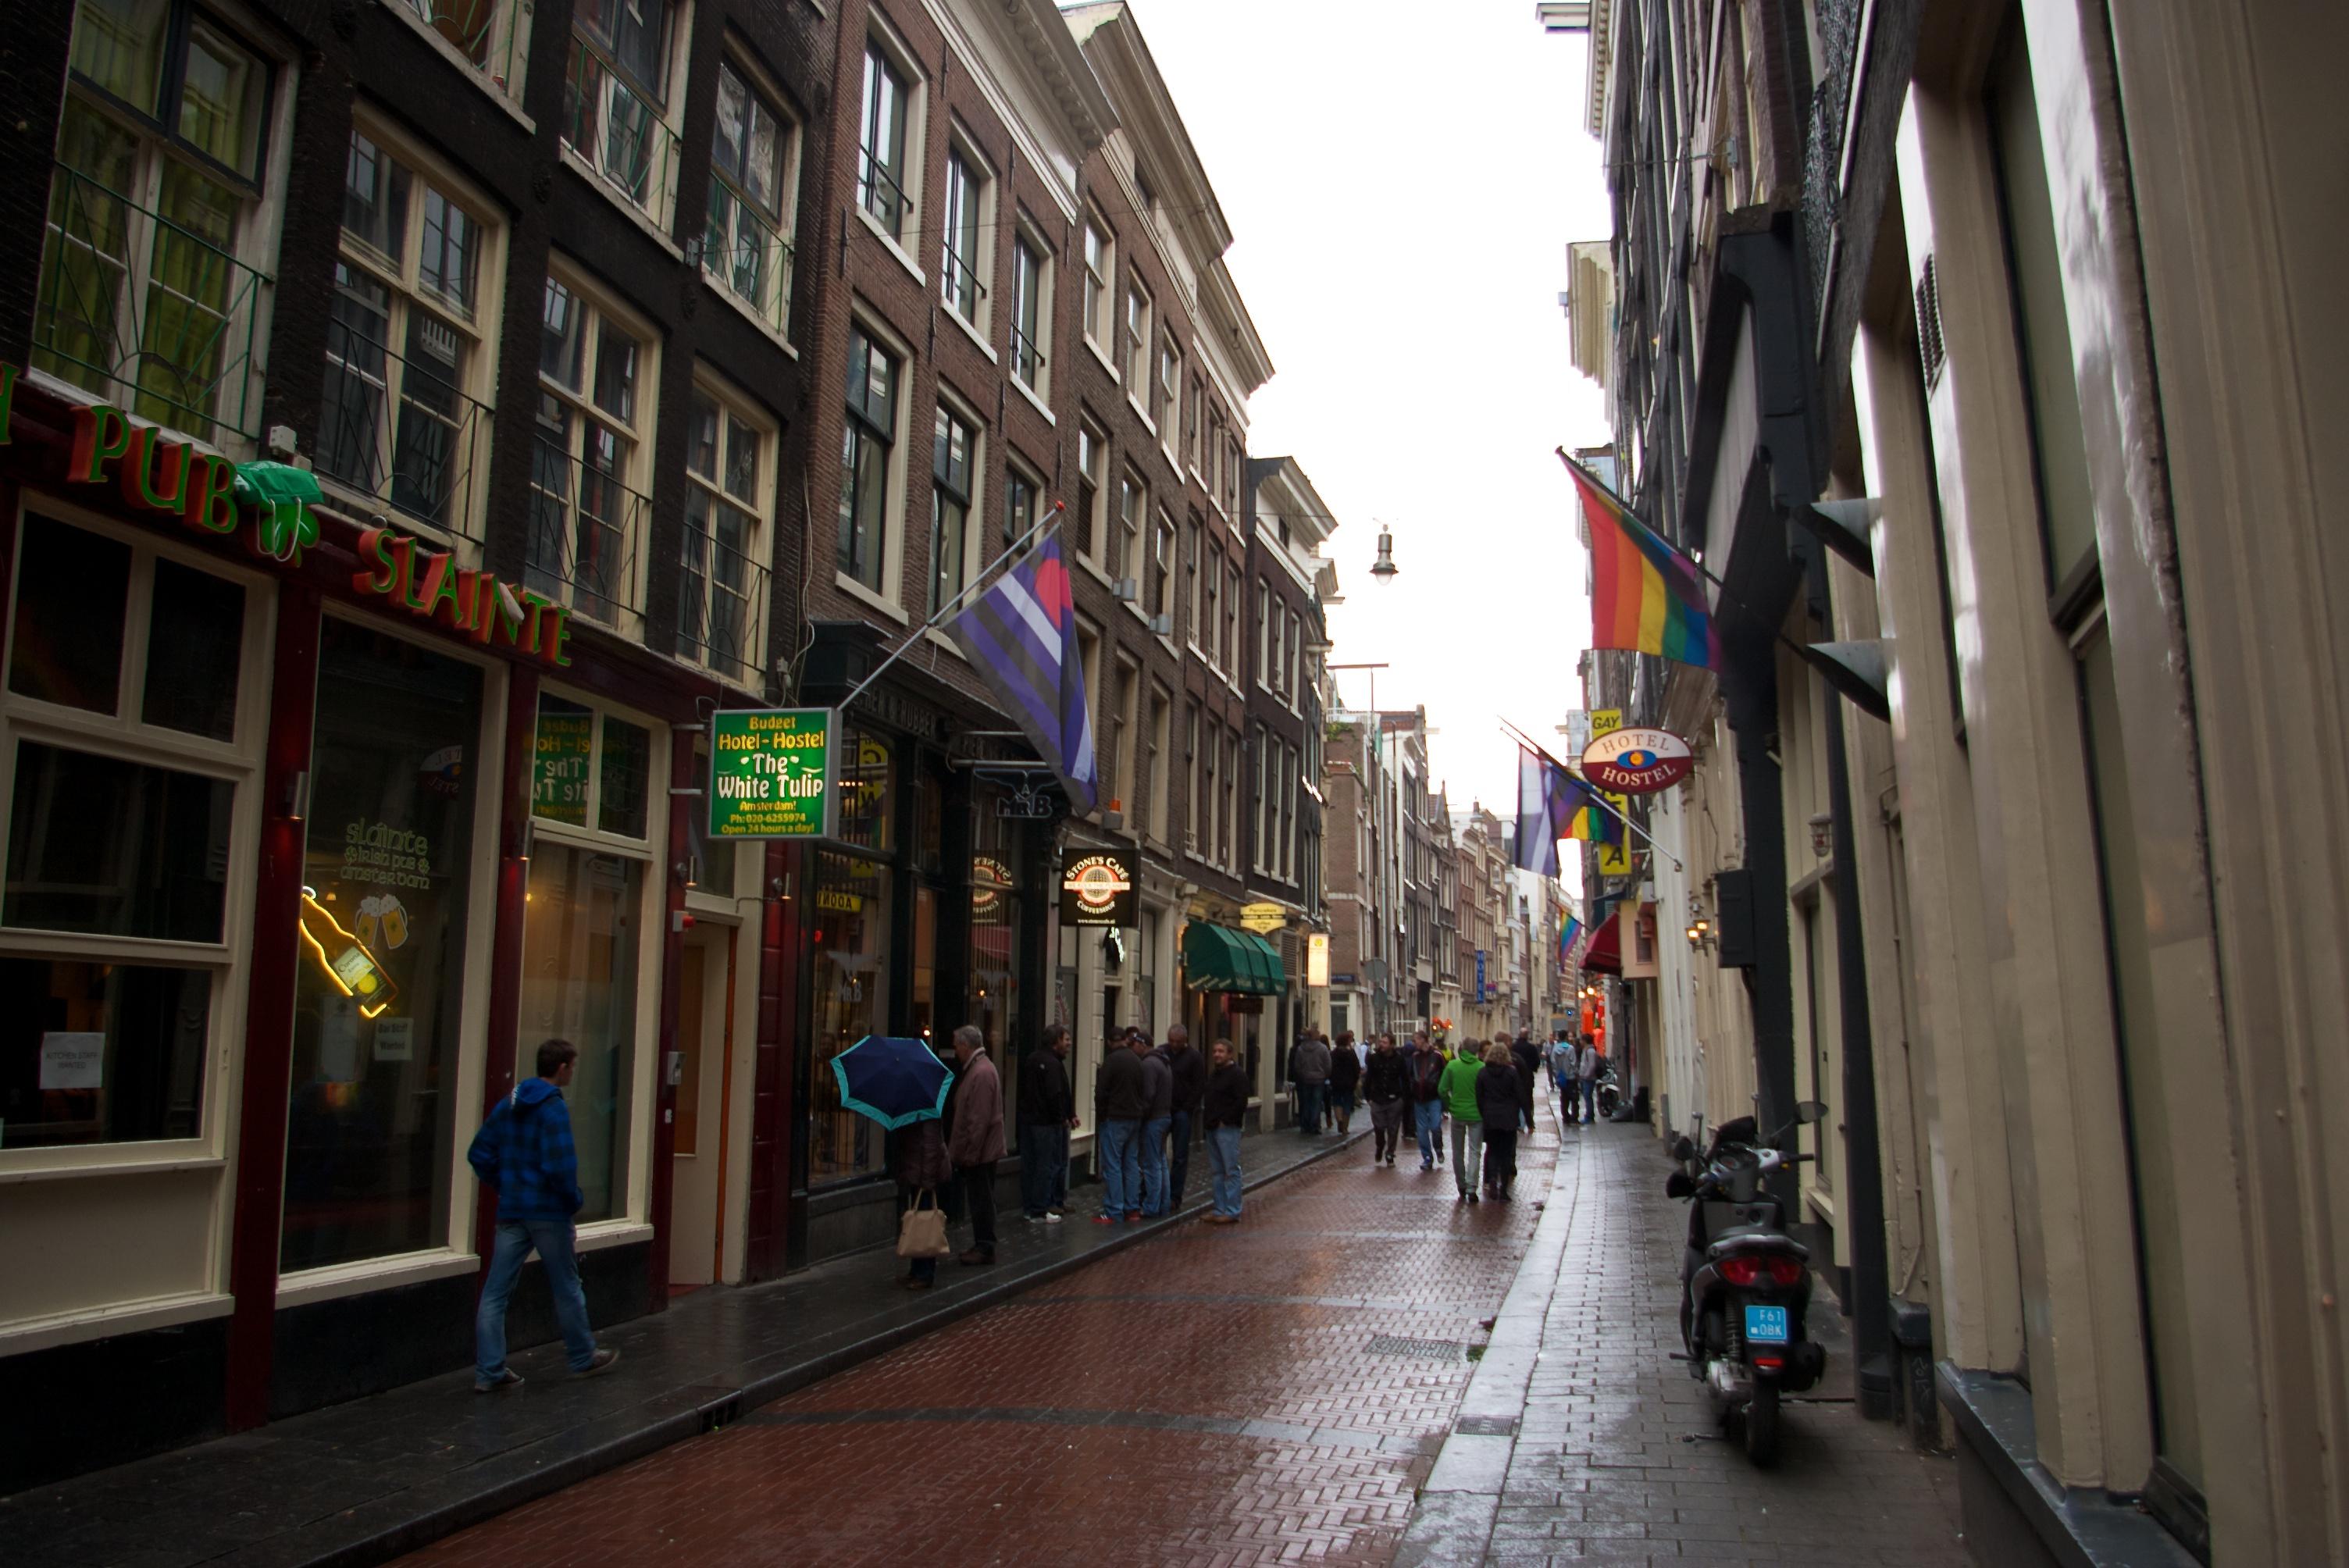 Black tulip hotel amsterdam sex gay